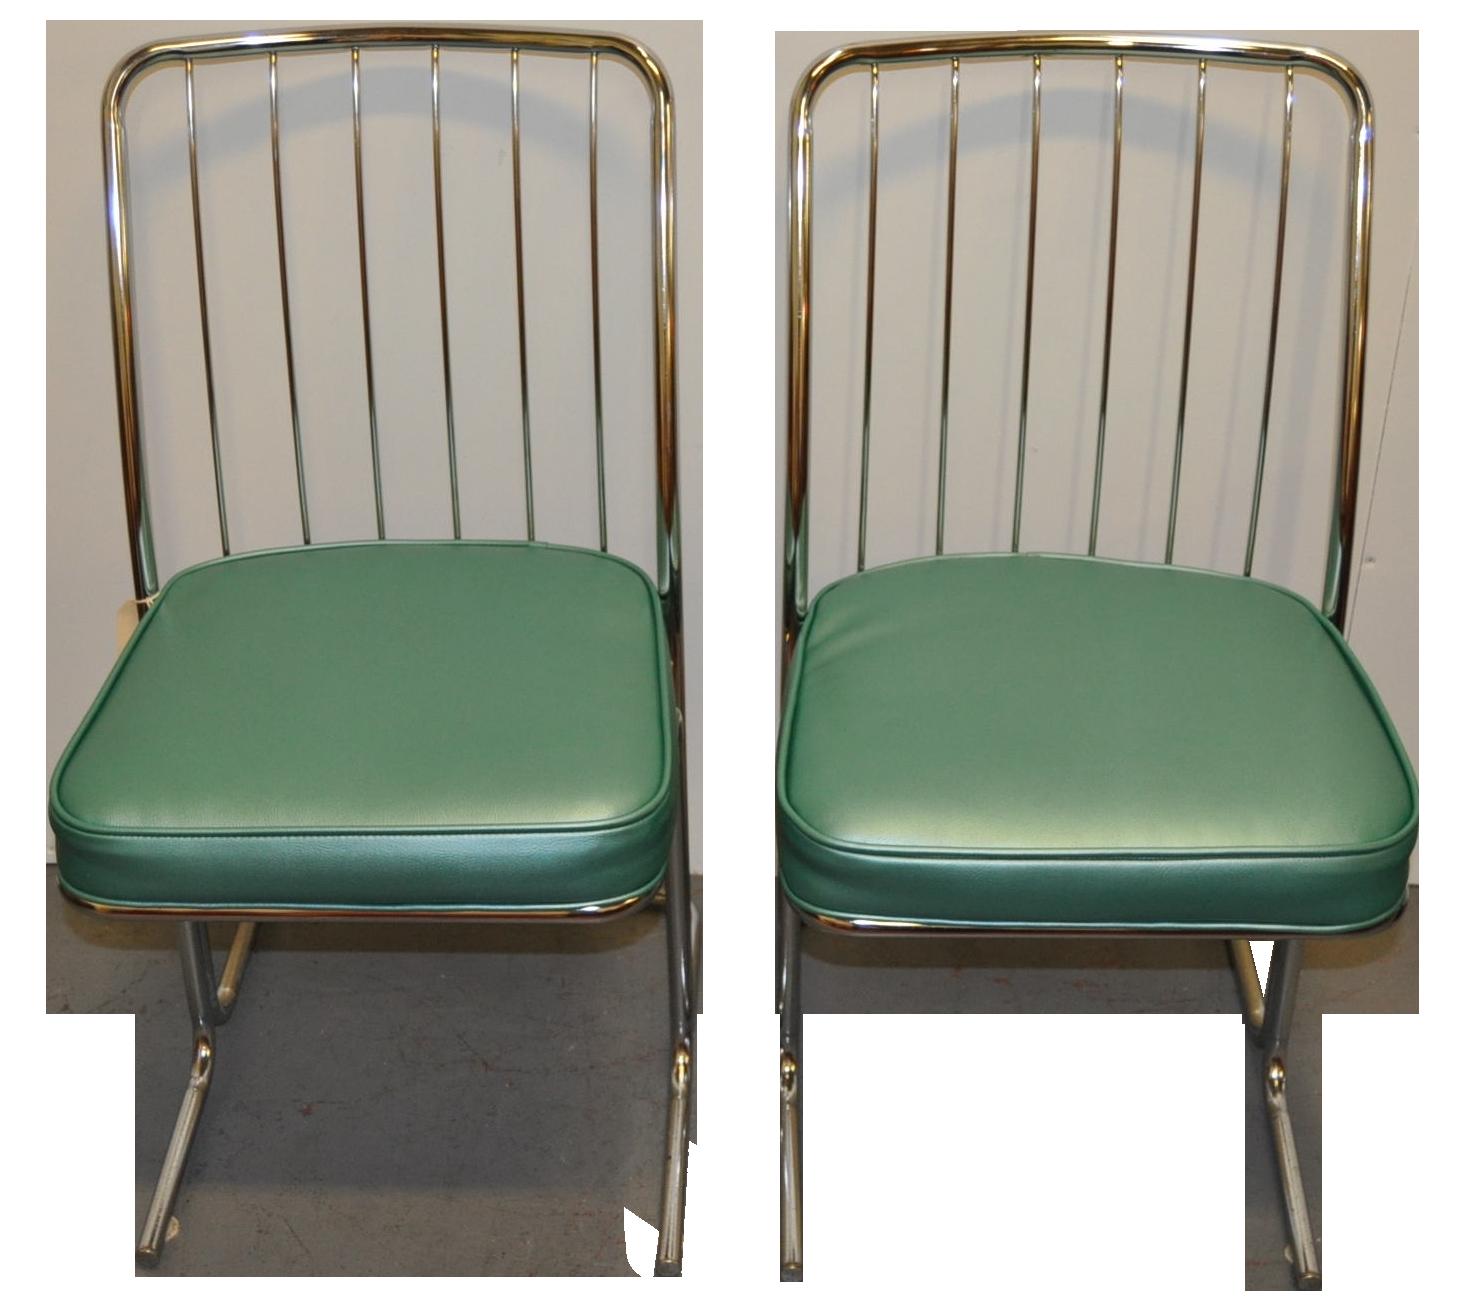 Kitchen Chairs Ireland: 1950s Chrome & Vinyl Kitchen Chairs - Set Of Four